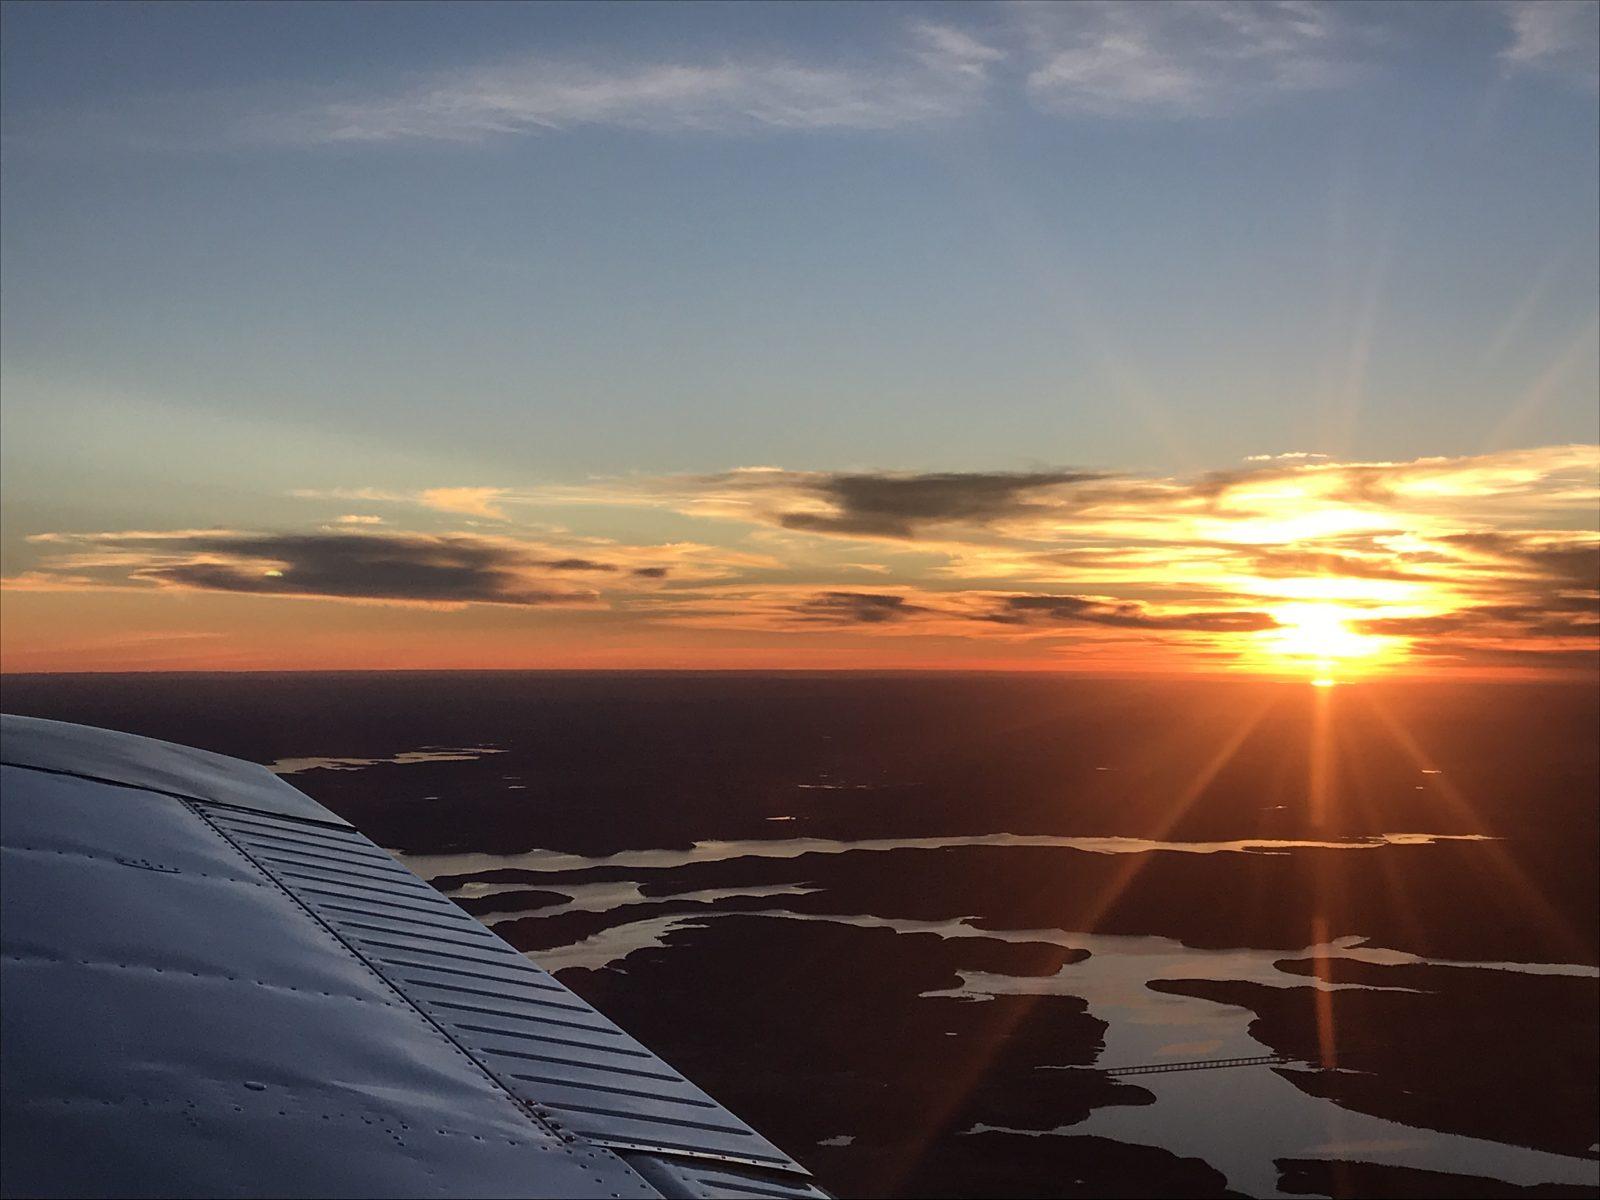 Evening Sunset Glory